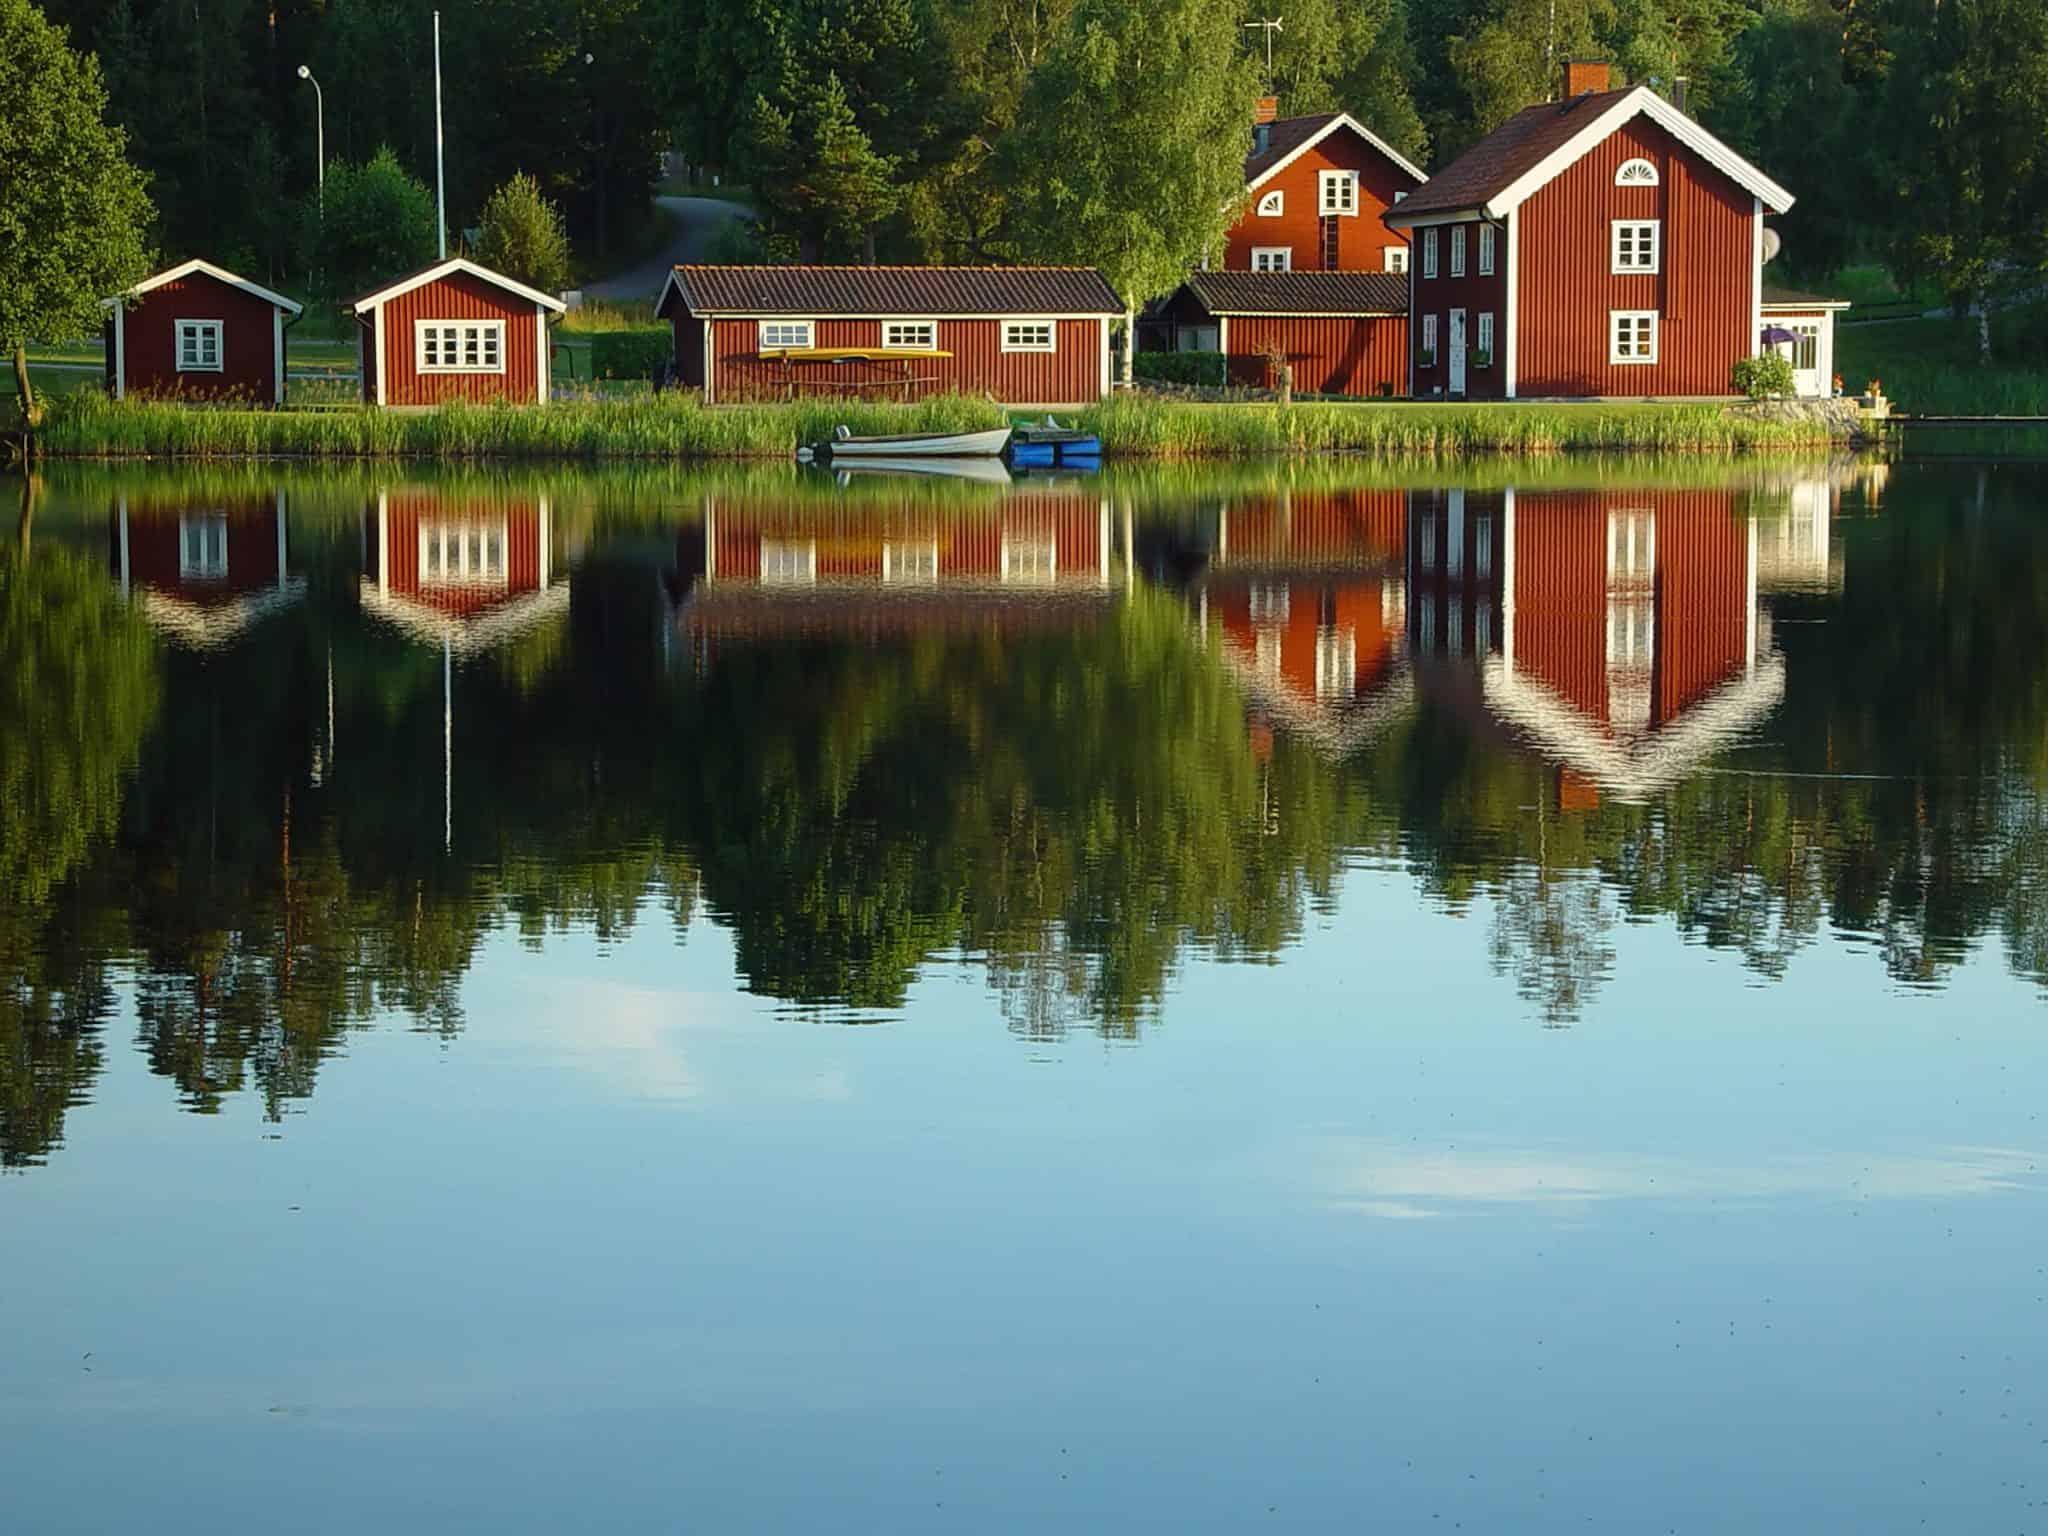 Zweeds-rood